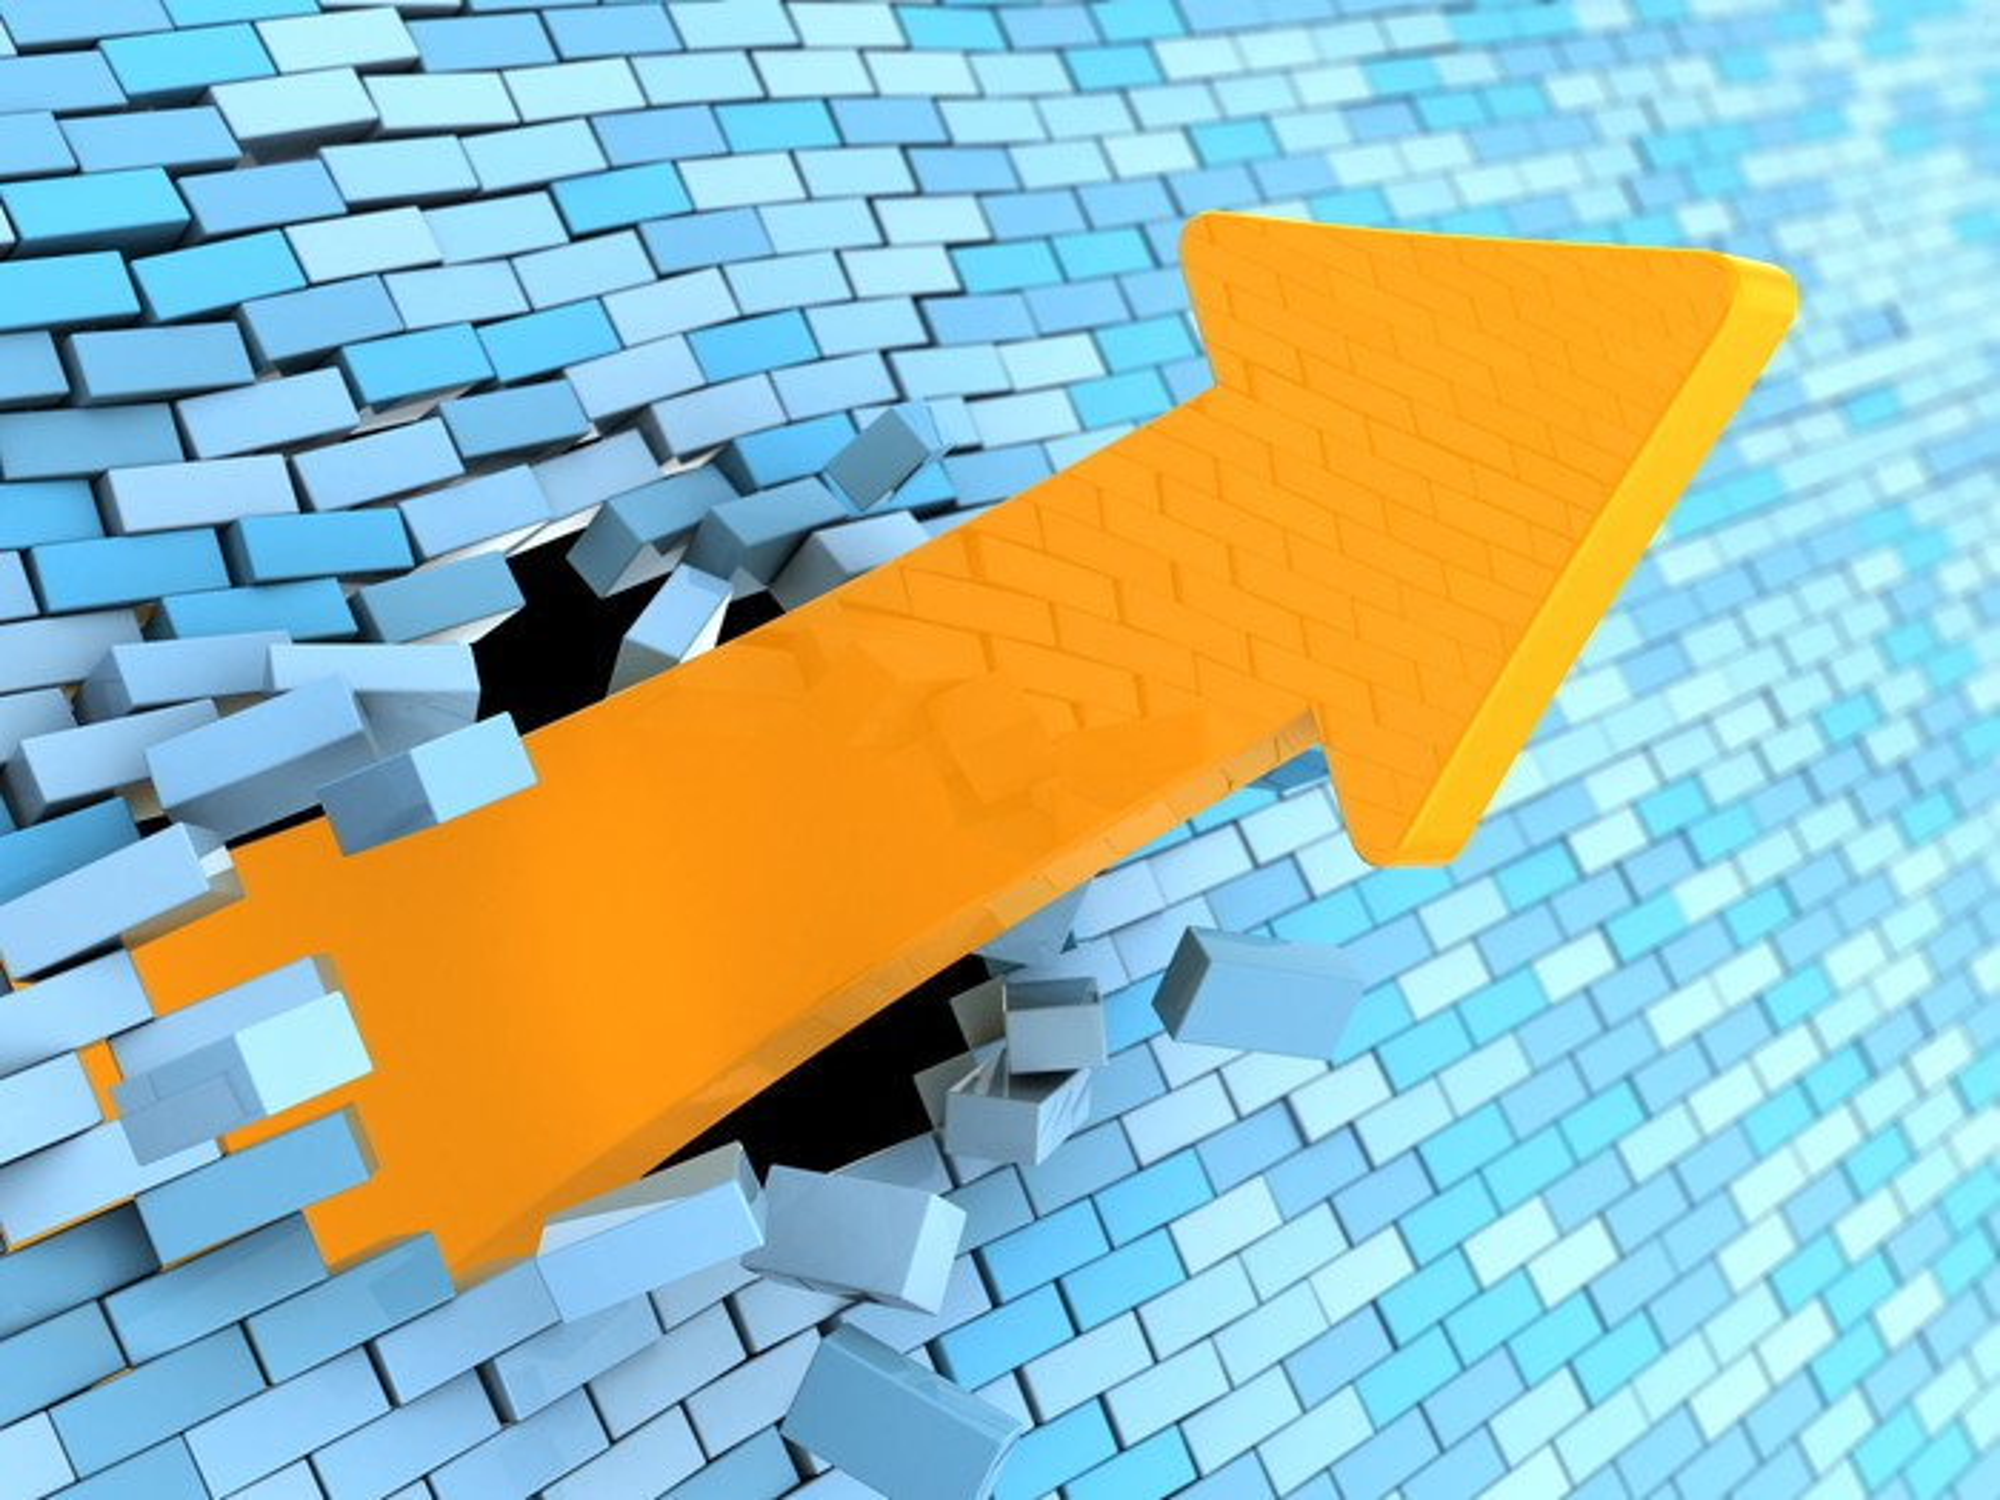 Orange charting arrow smashing upwards, through a light blue brick wall